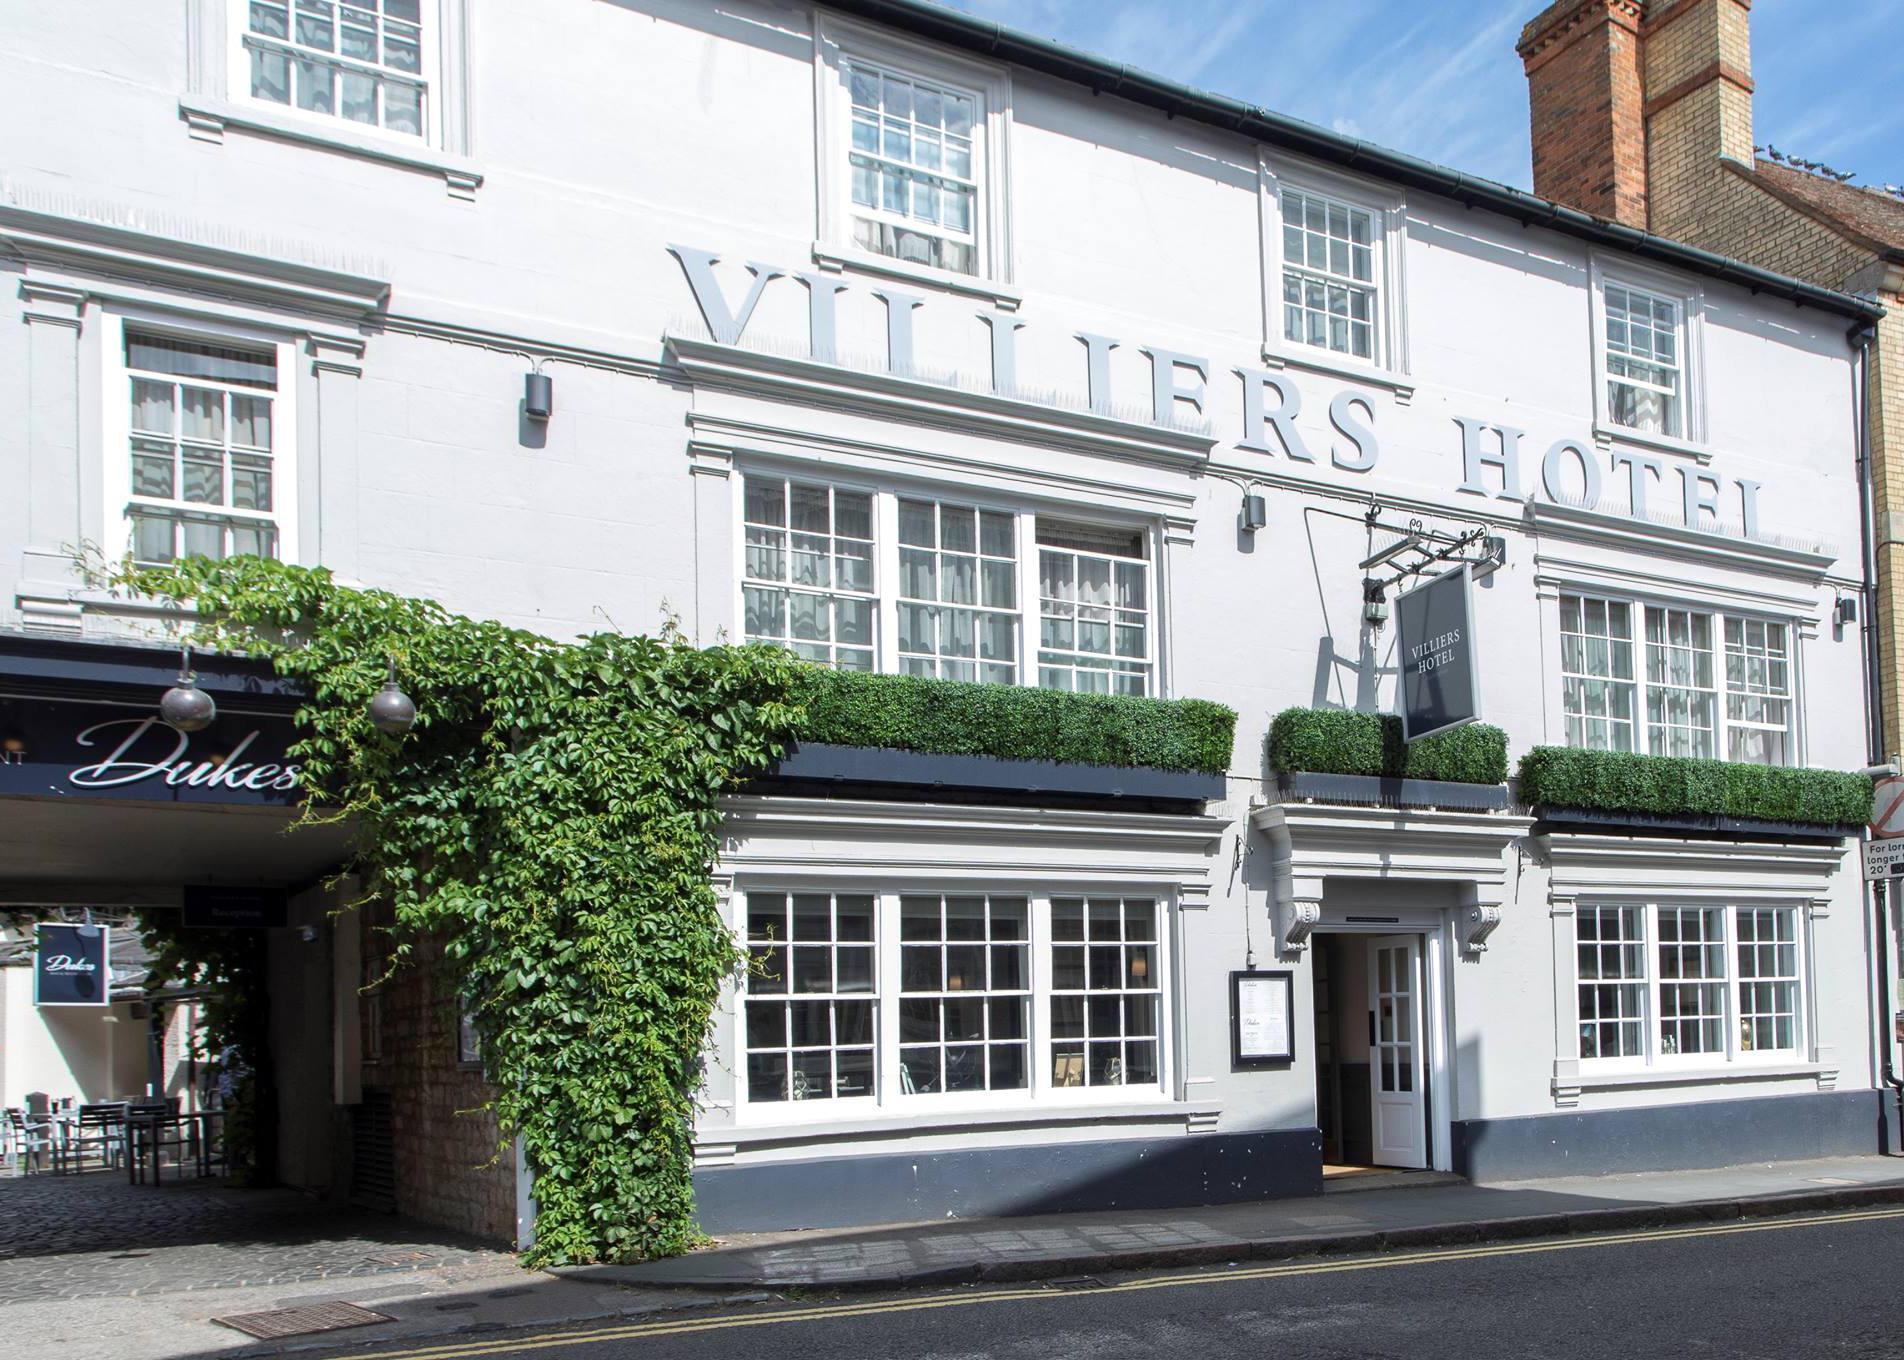 Villiers Hotel, Buckinghamshire. Staycation Inspiration by Malvern Garden Buildings